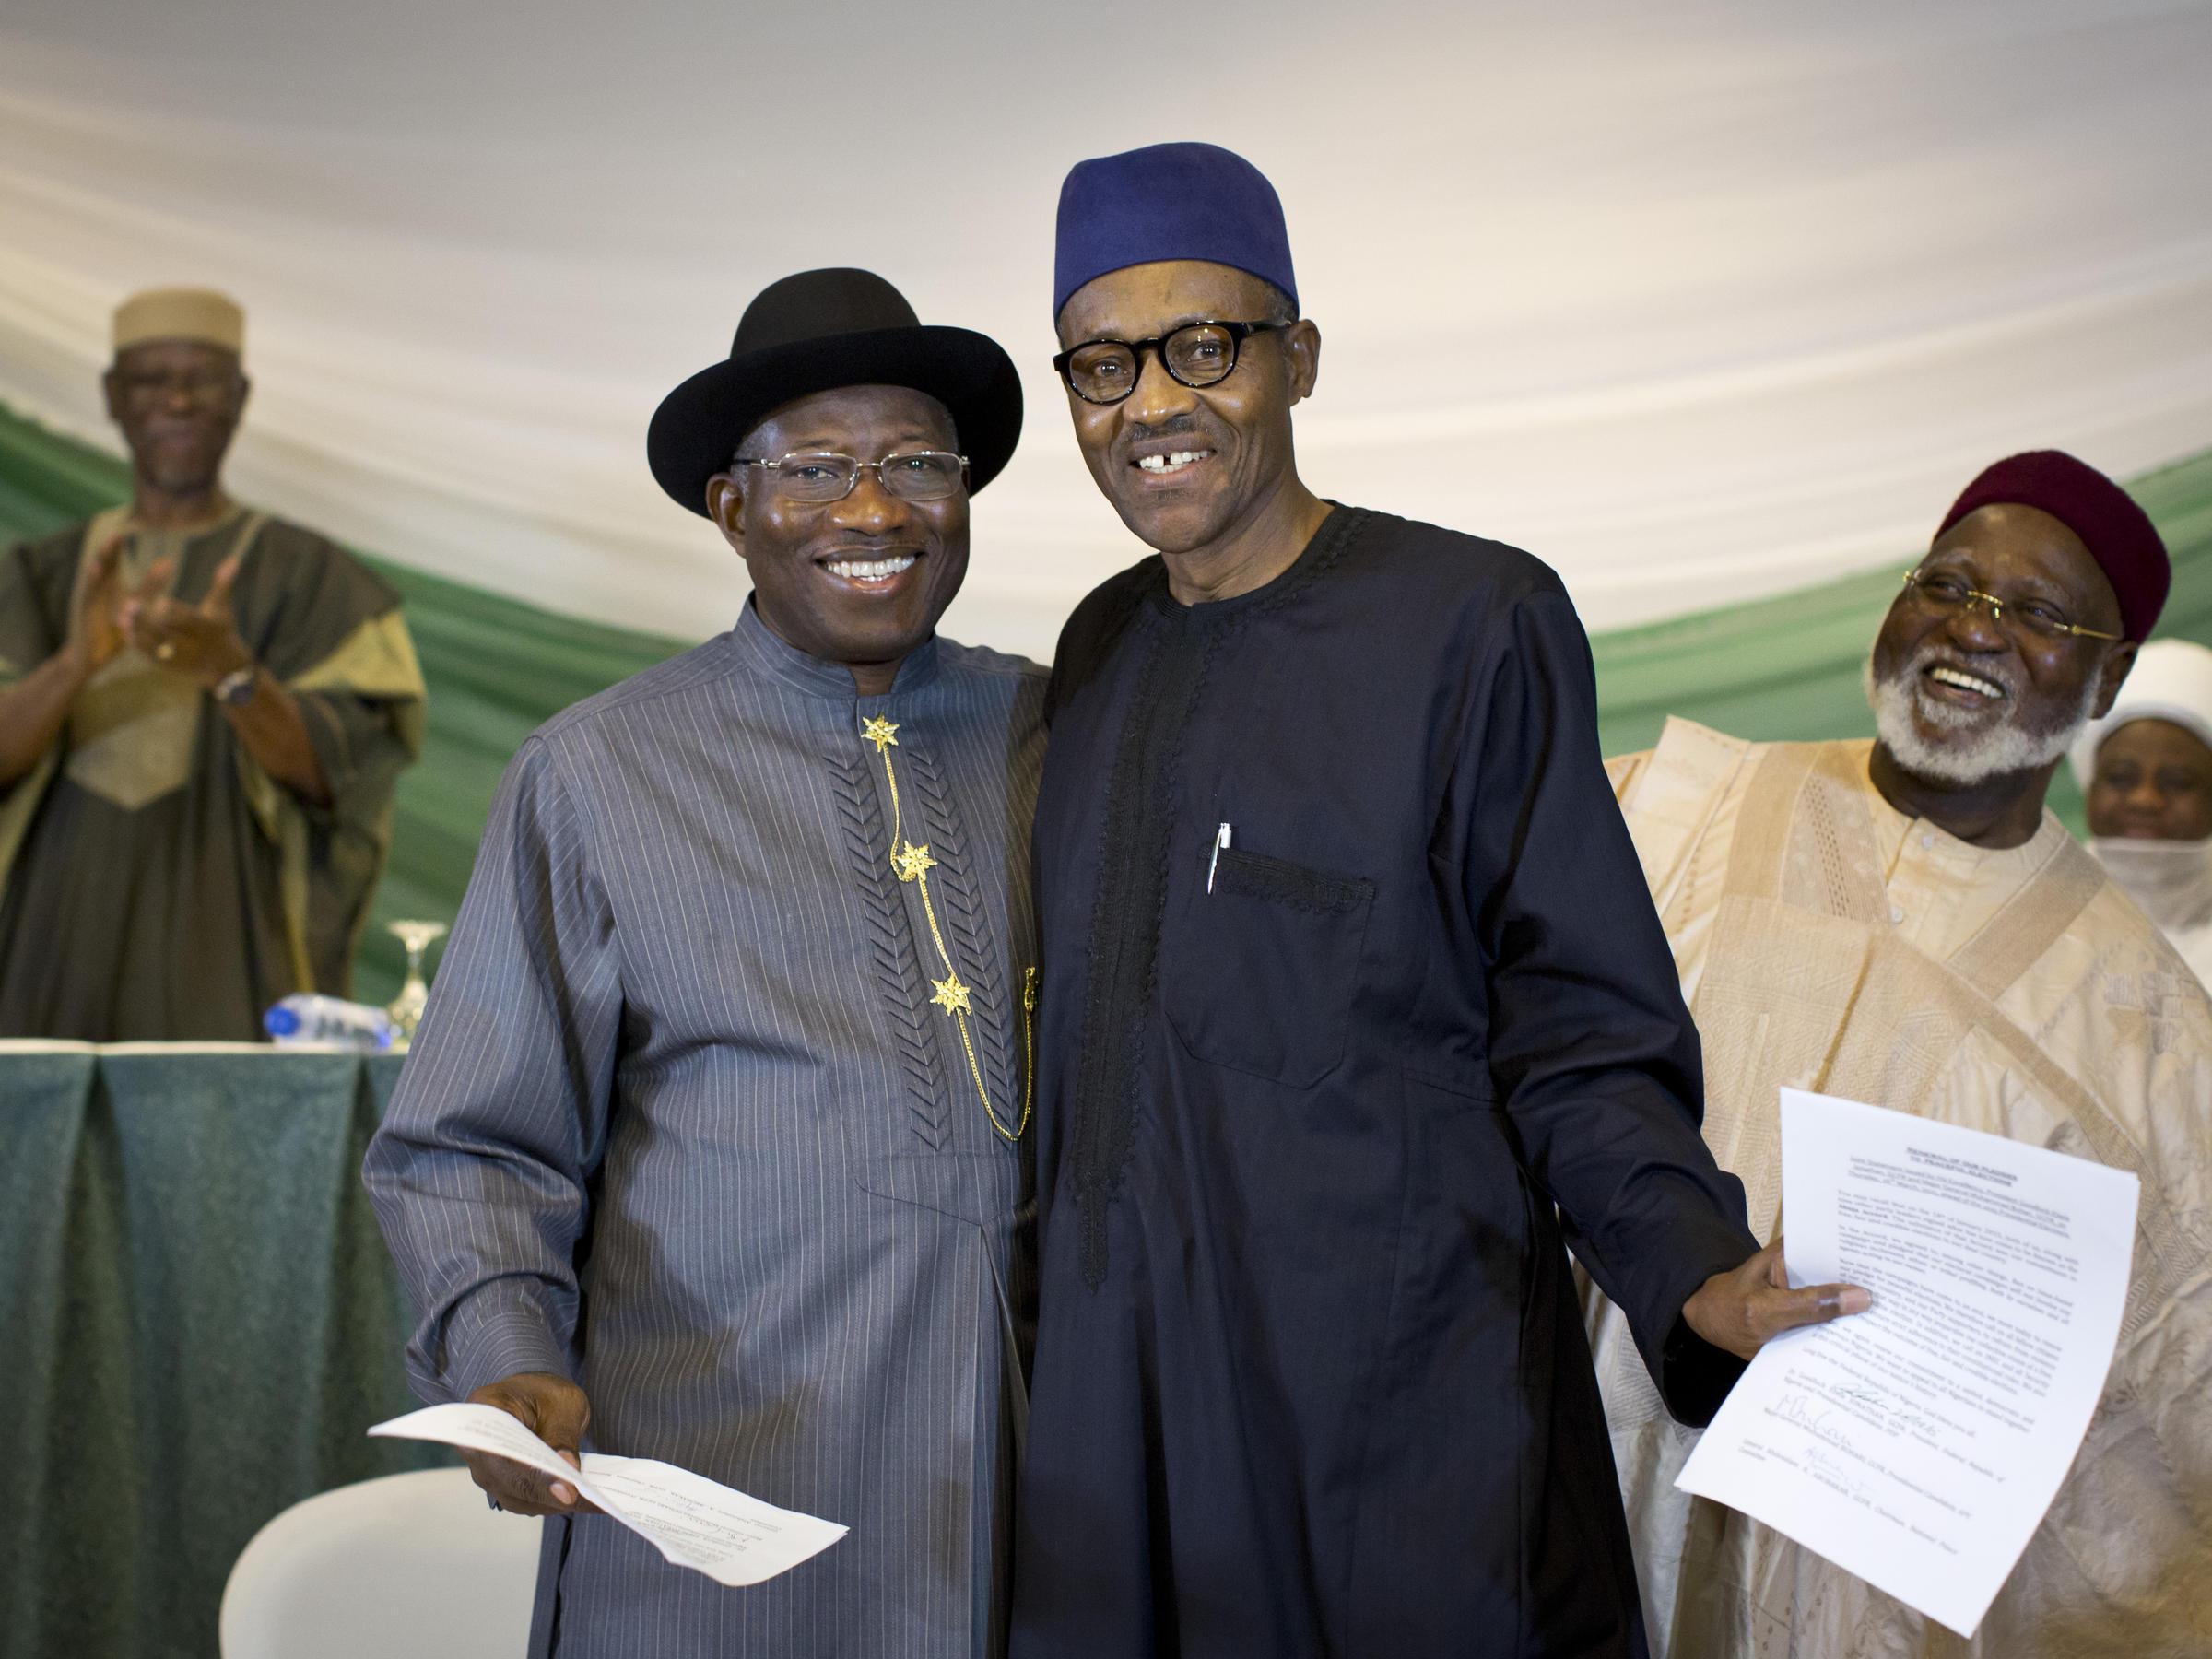 The Latest: Nigeria's president declared election winner